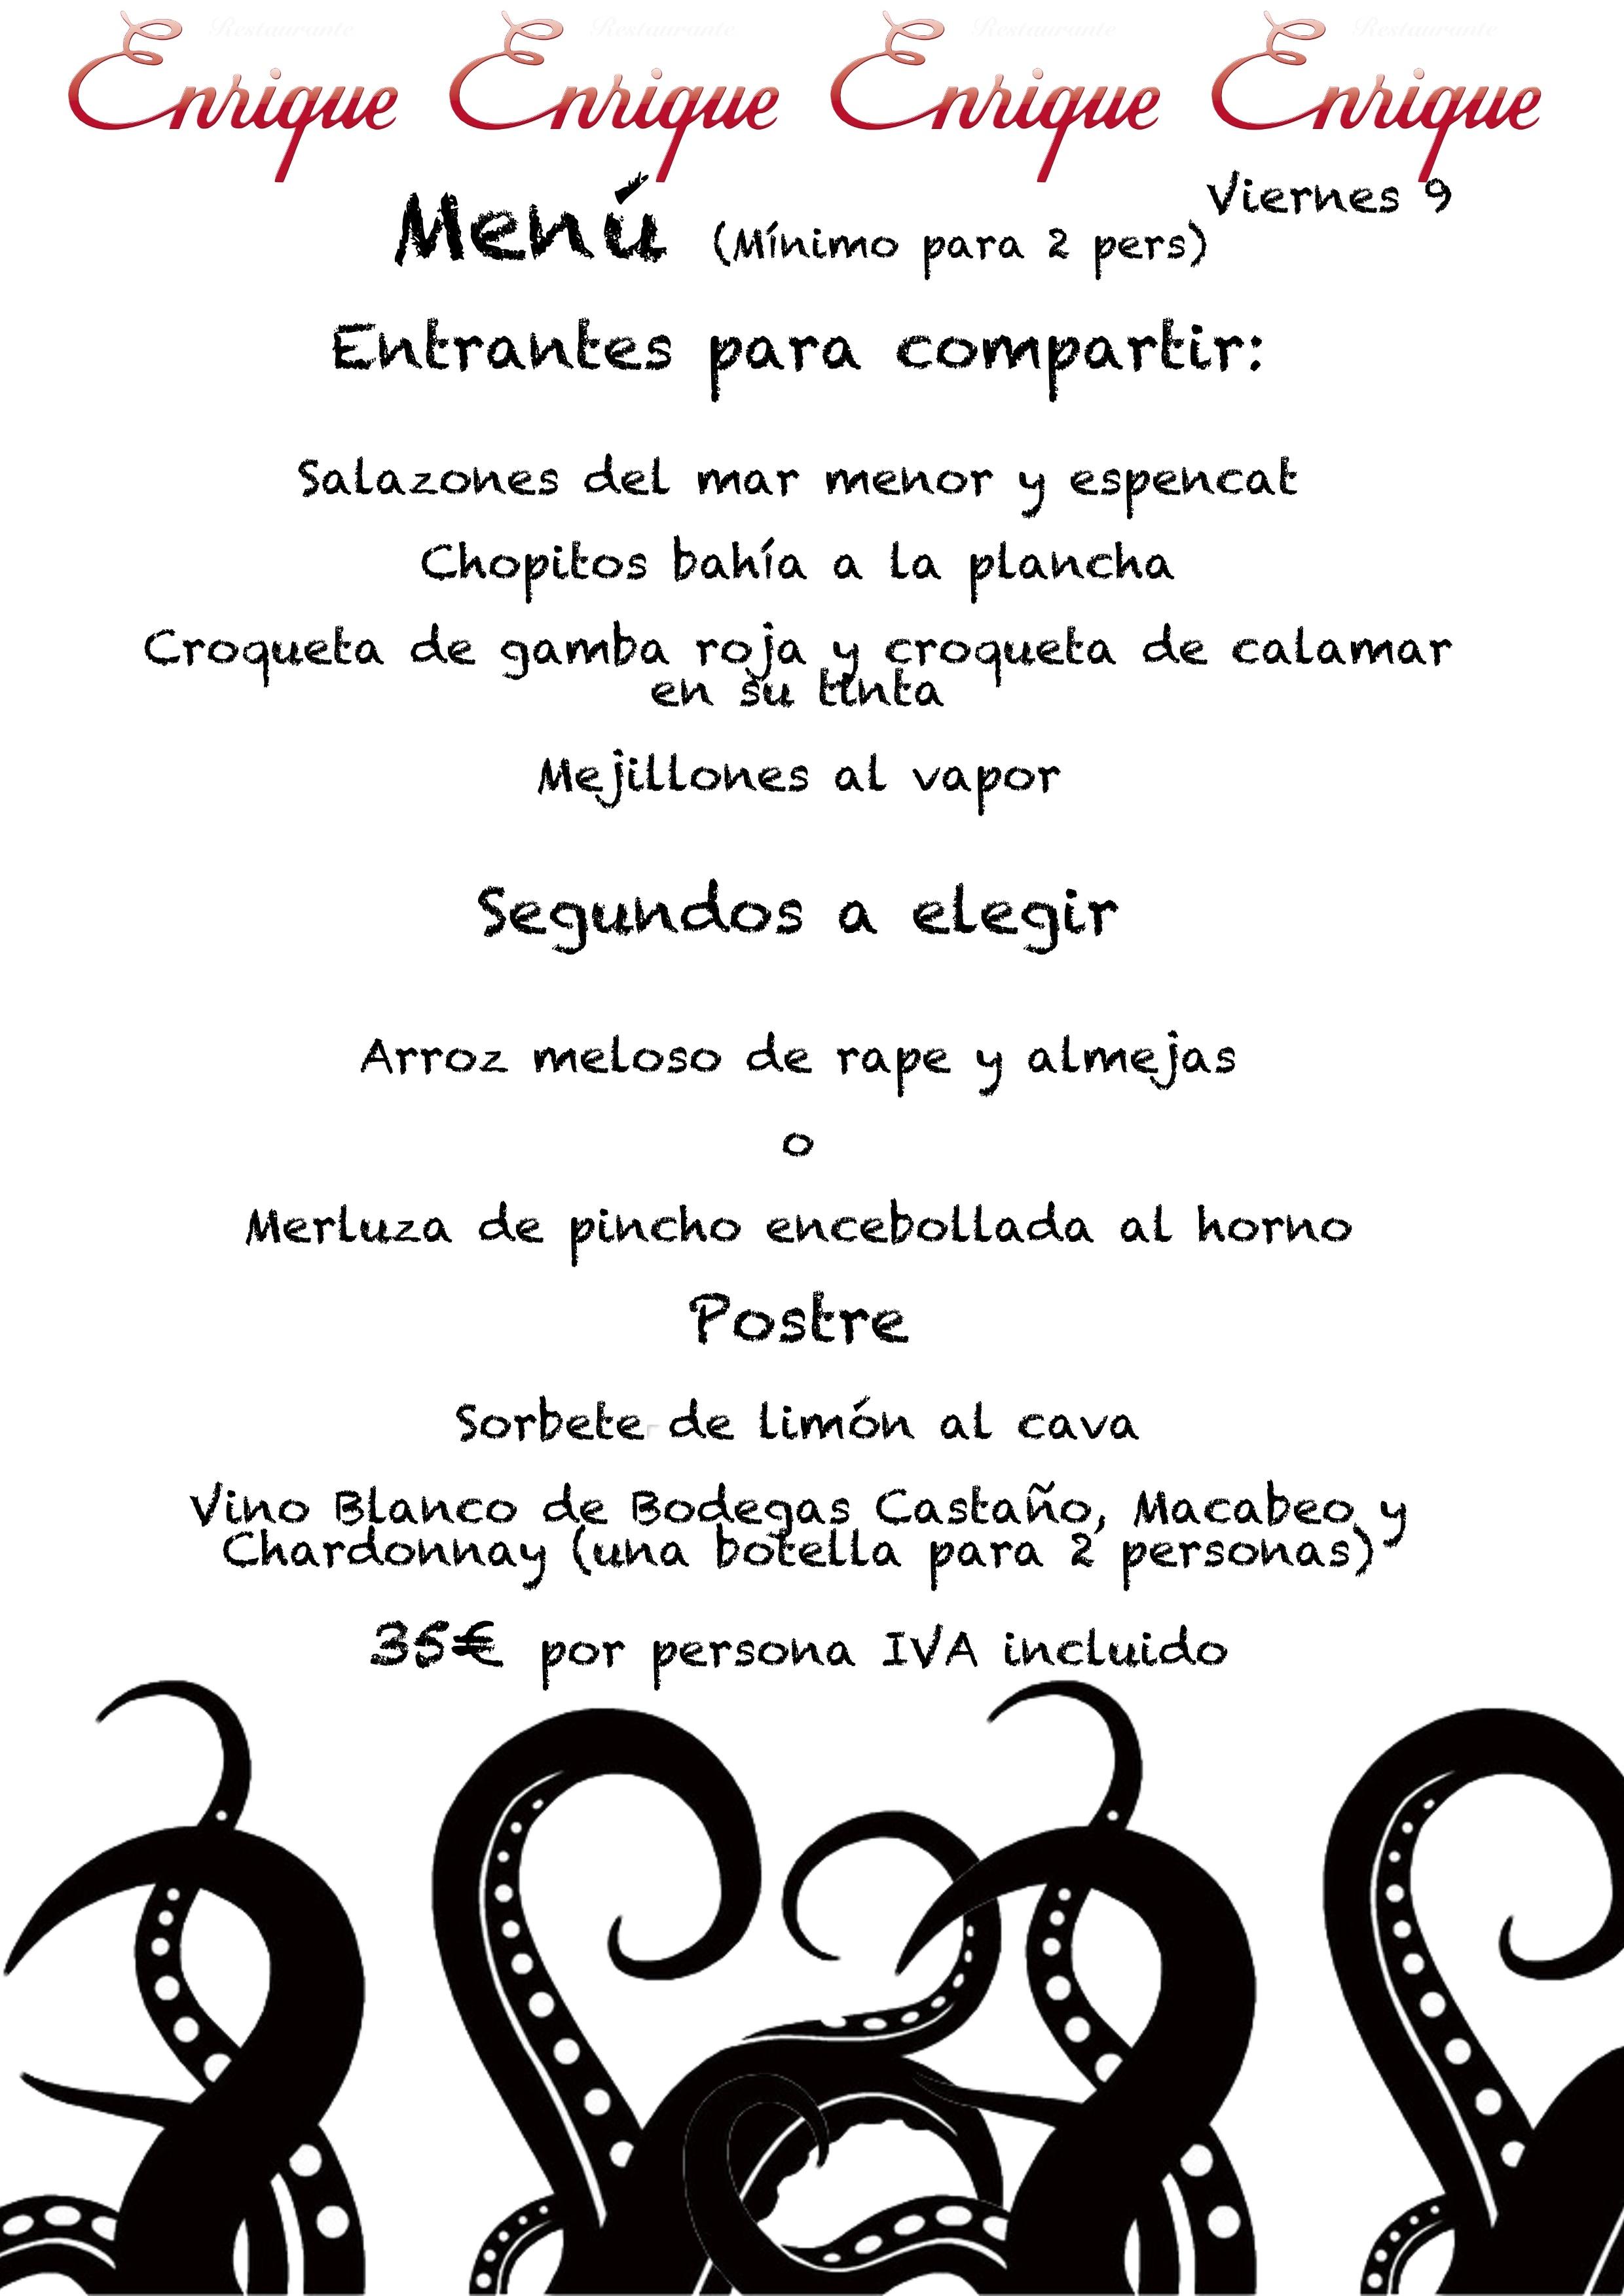 Restaurante Enrique Albir Menú